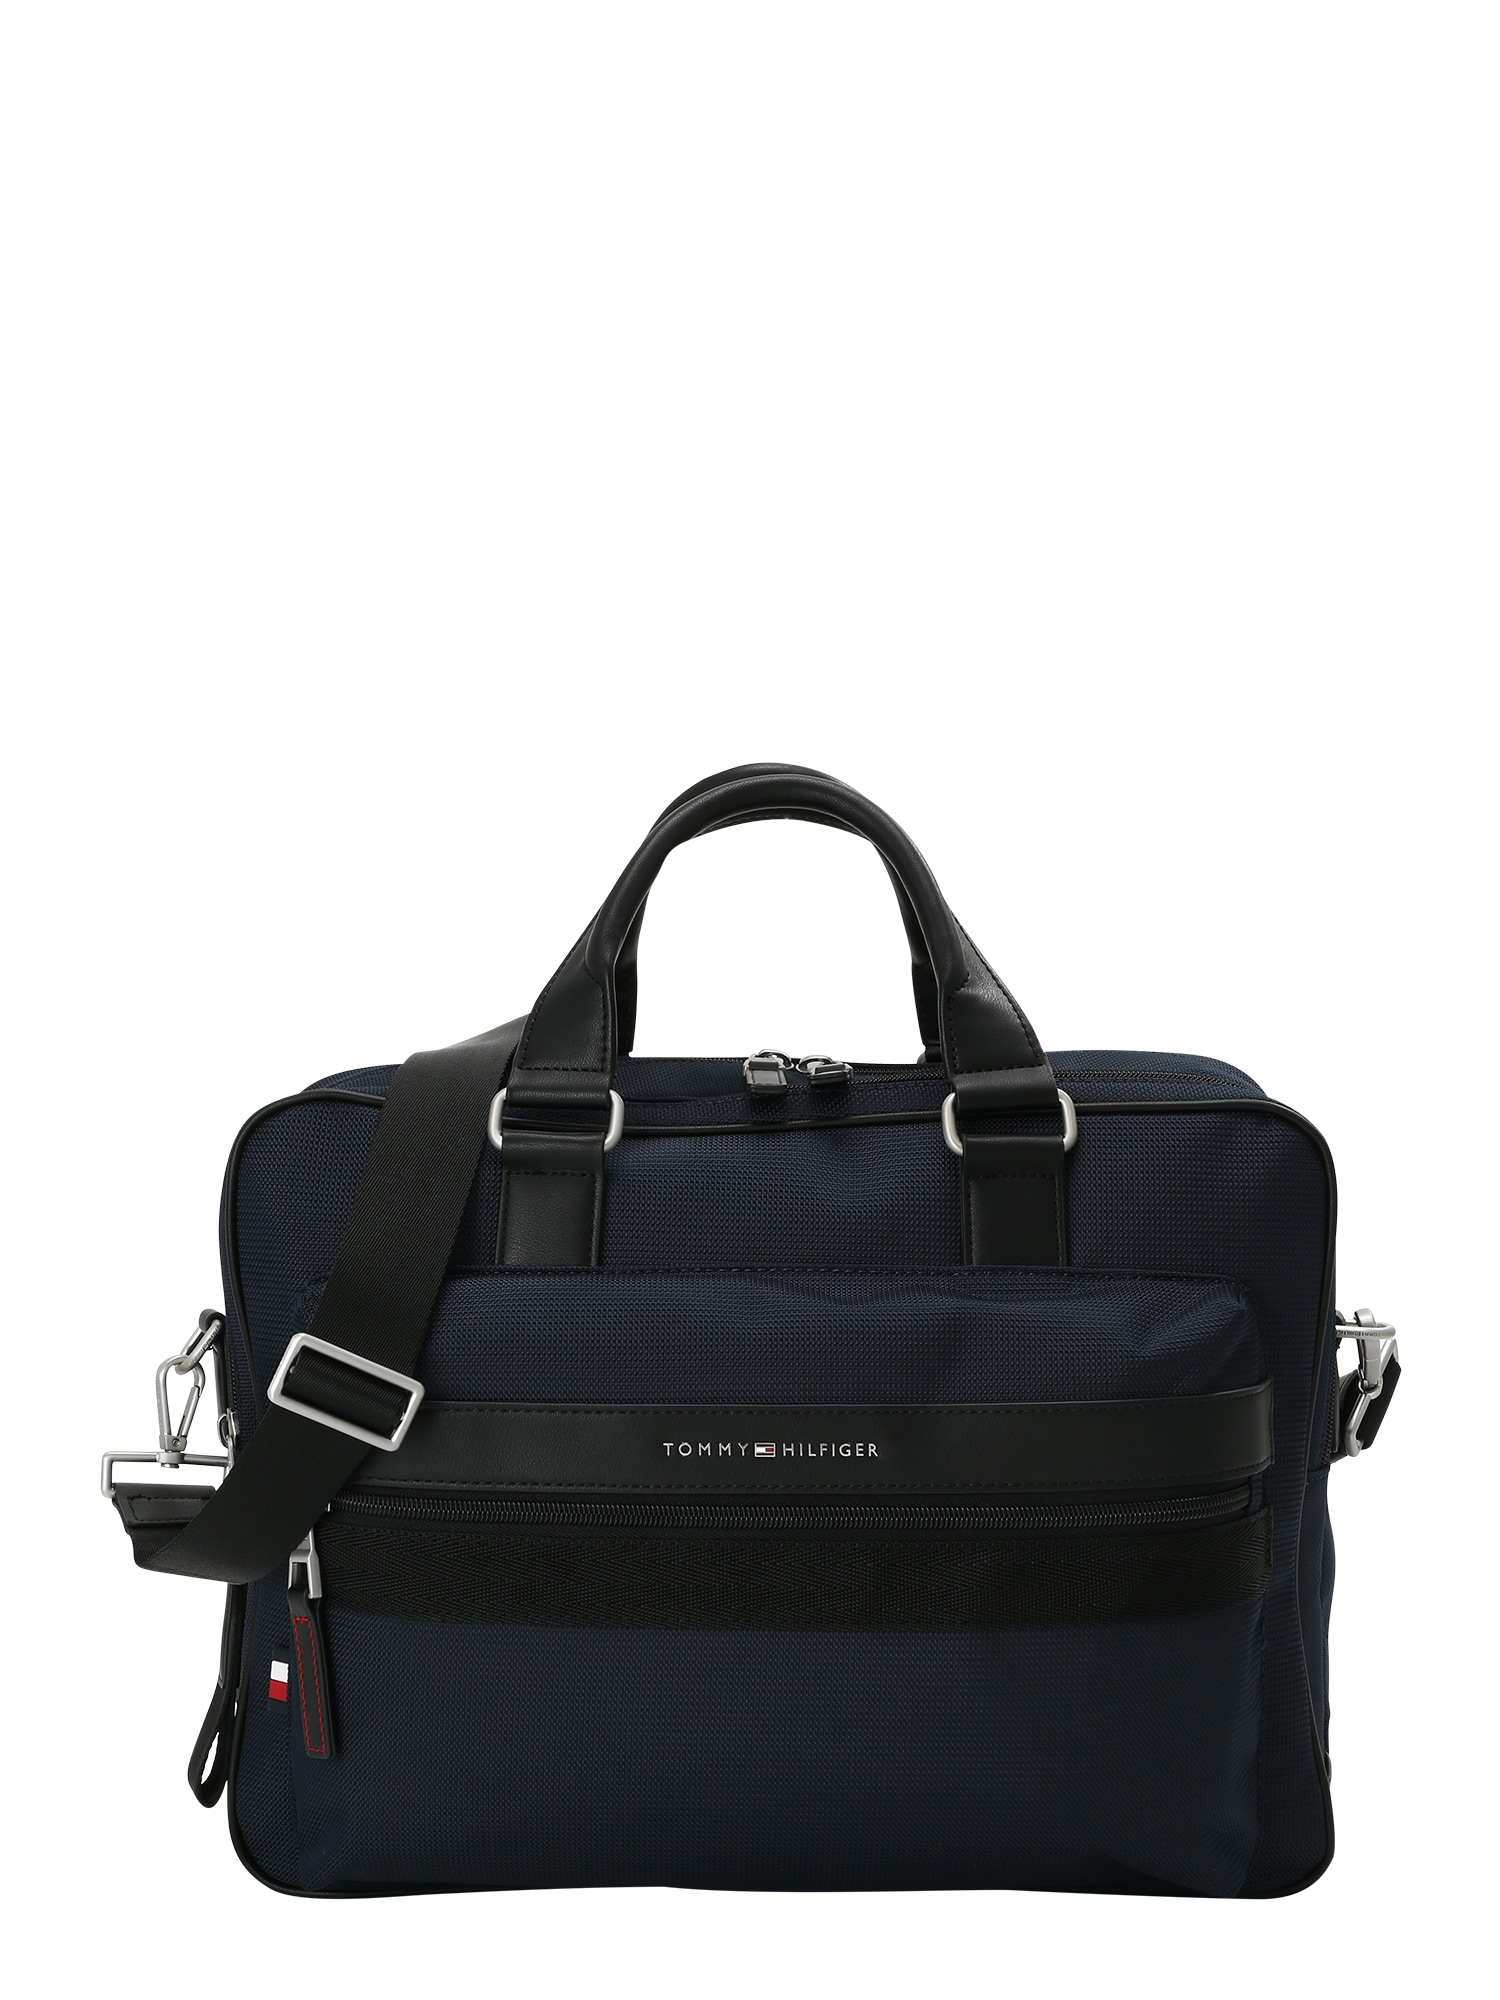 TOMMY HILFIGER Kelioninis krepšys tamsiai mėlyna / juoda